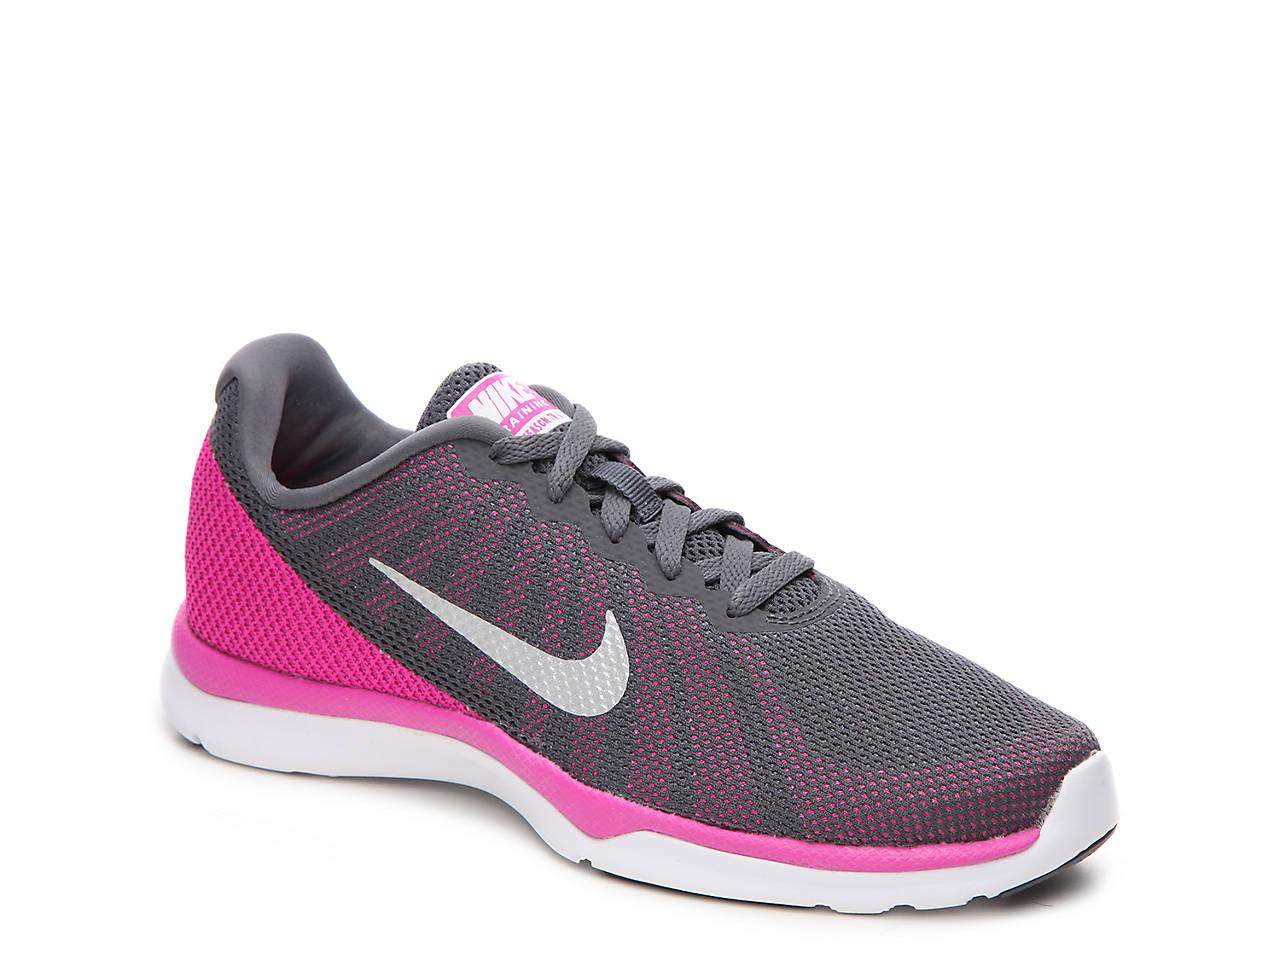 check out 19160 f7001 Nike. In Season TR 6 Training Shoe - Women s